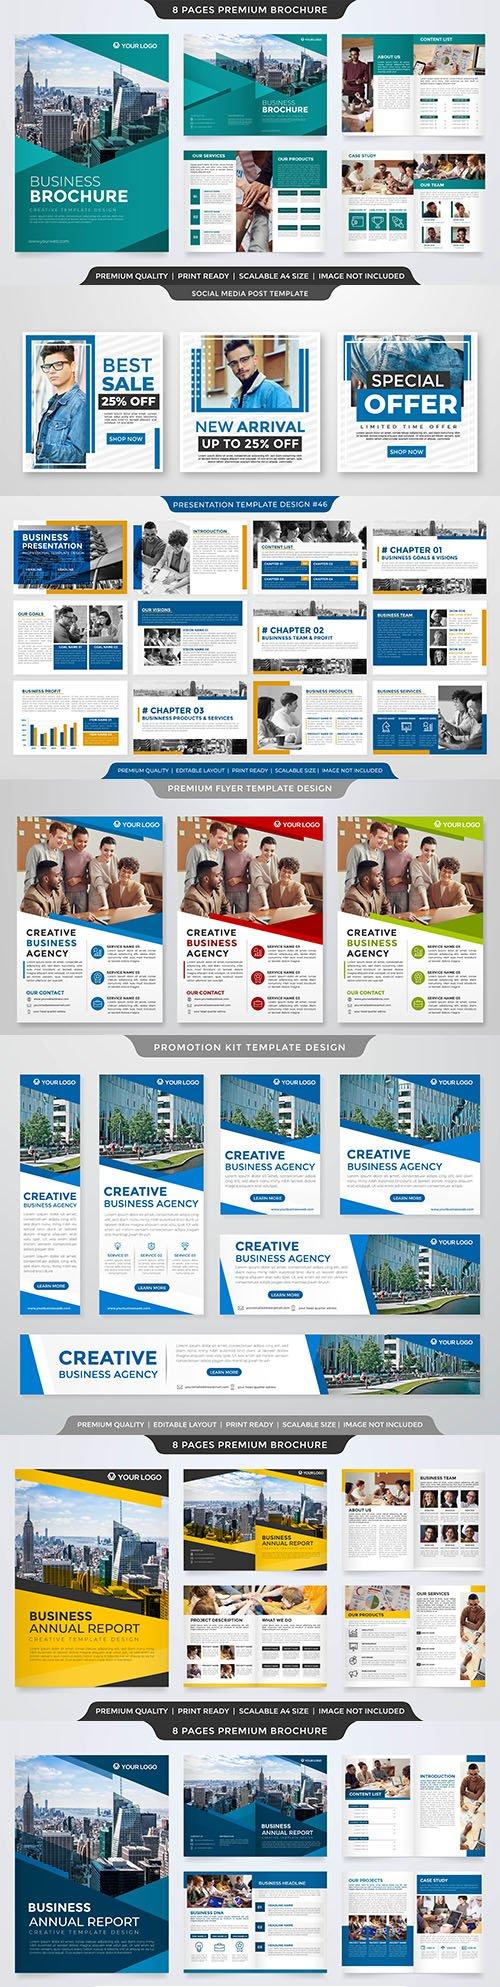 Minimalist business presentation layout template